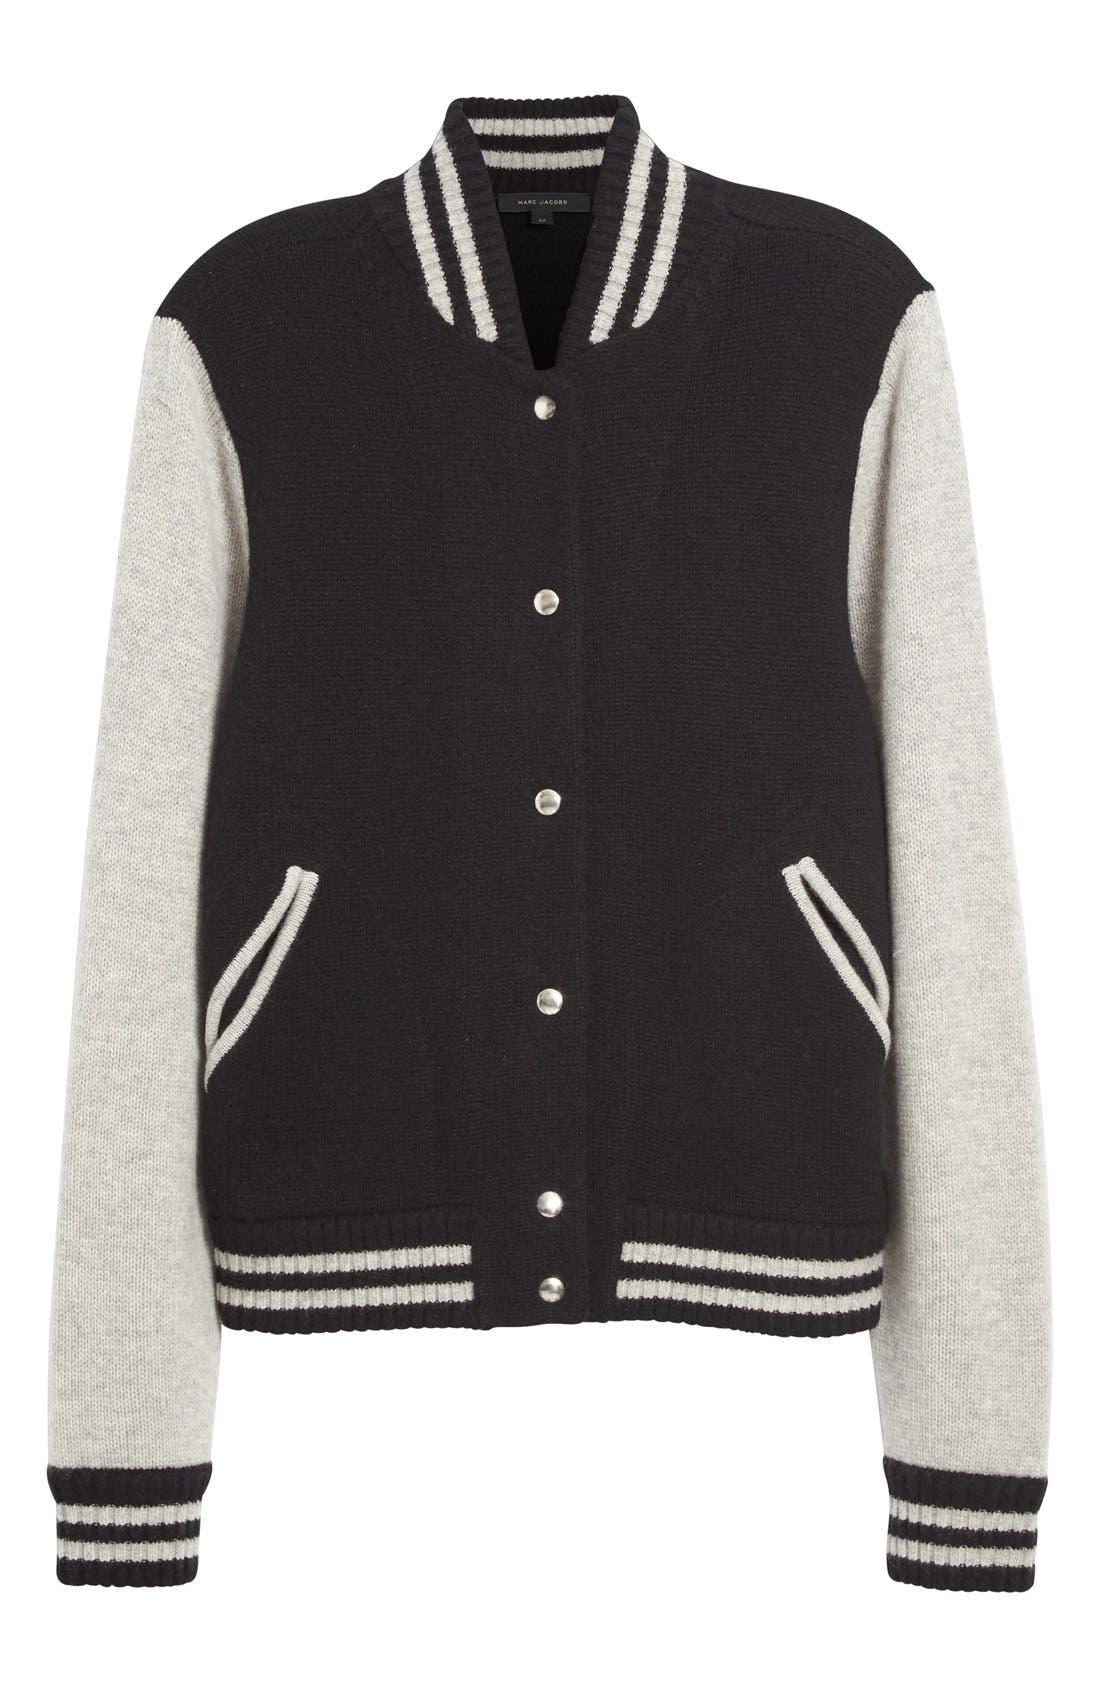 Stripe Detail Wool & Cashmere Knit Varsity Jacket,                             Alternate thumbnail 4, color,                             Black